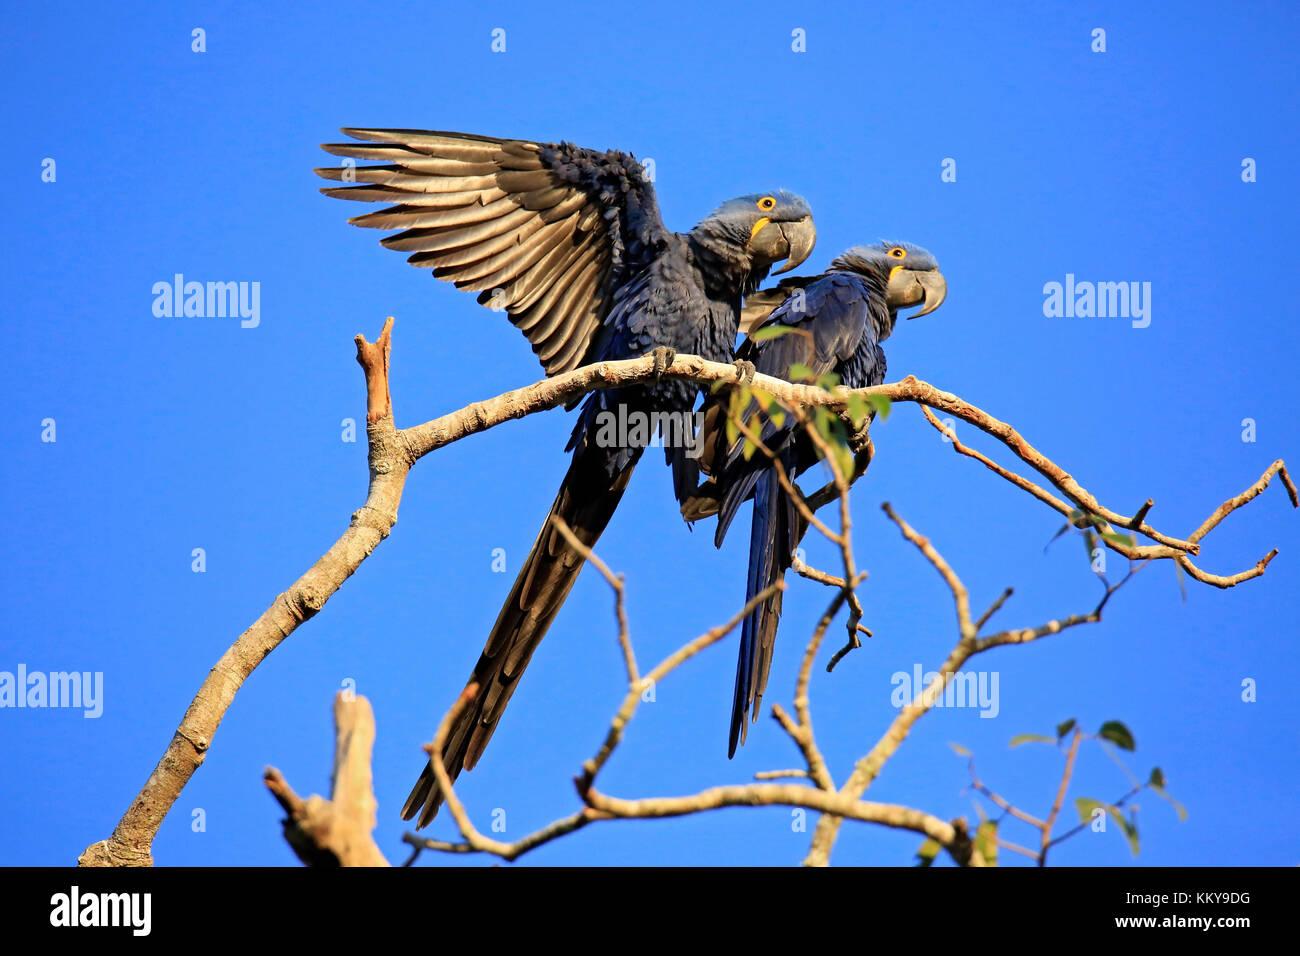 Two Hyacinth Macaws on a Branch. Pantanal, Brazil - Stock Image